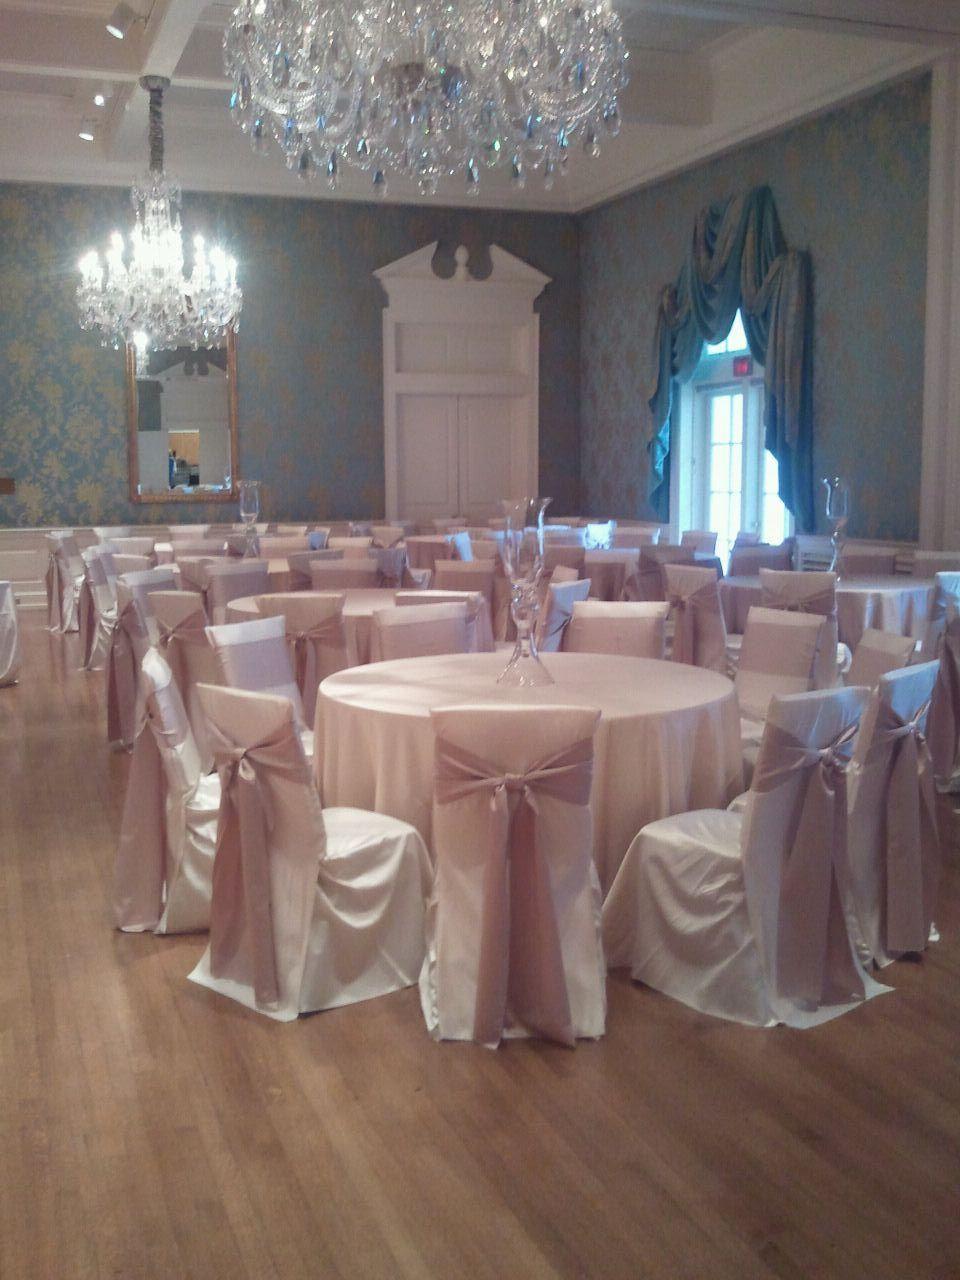 Junior League Wedding // Houston TX // Aztec Events u0026 Tents & Junior League Wedding // Houston TX // Aztec Events u0026 Tents ...